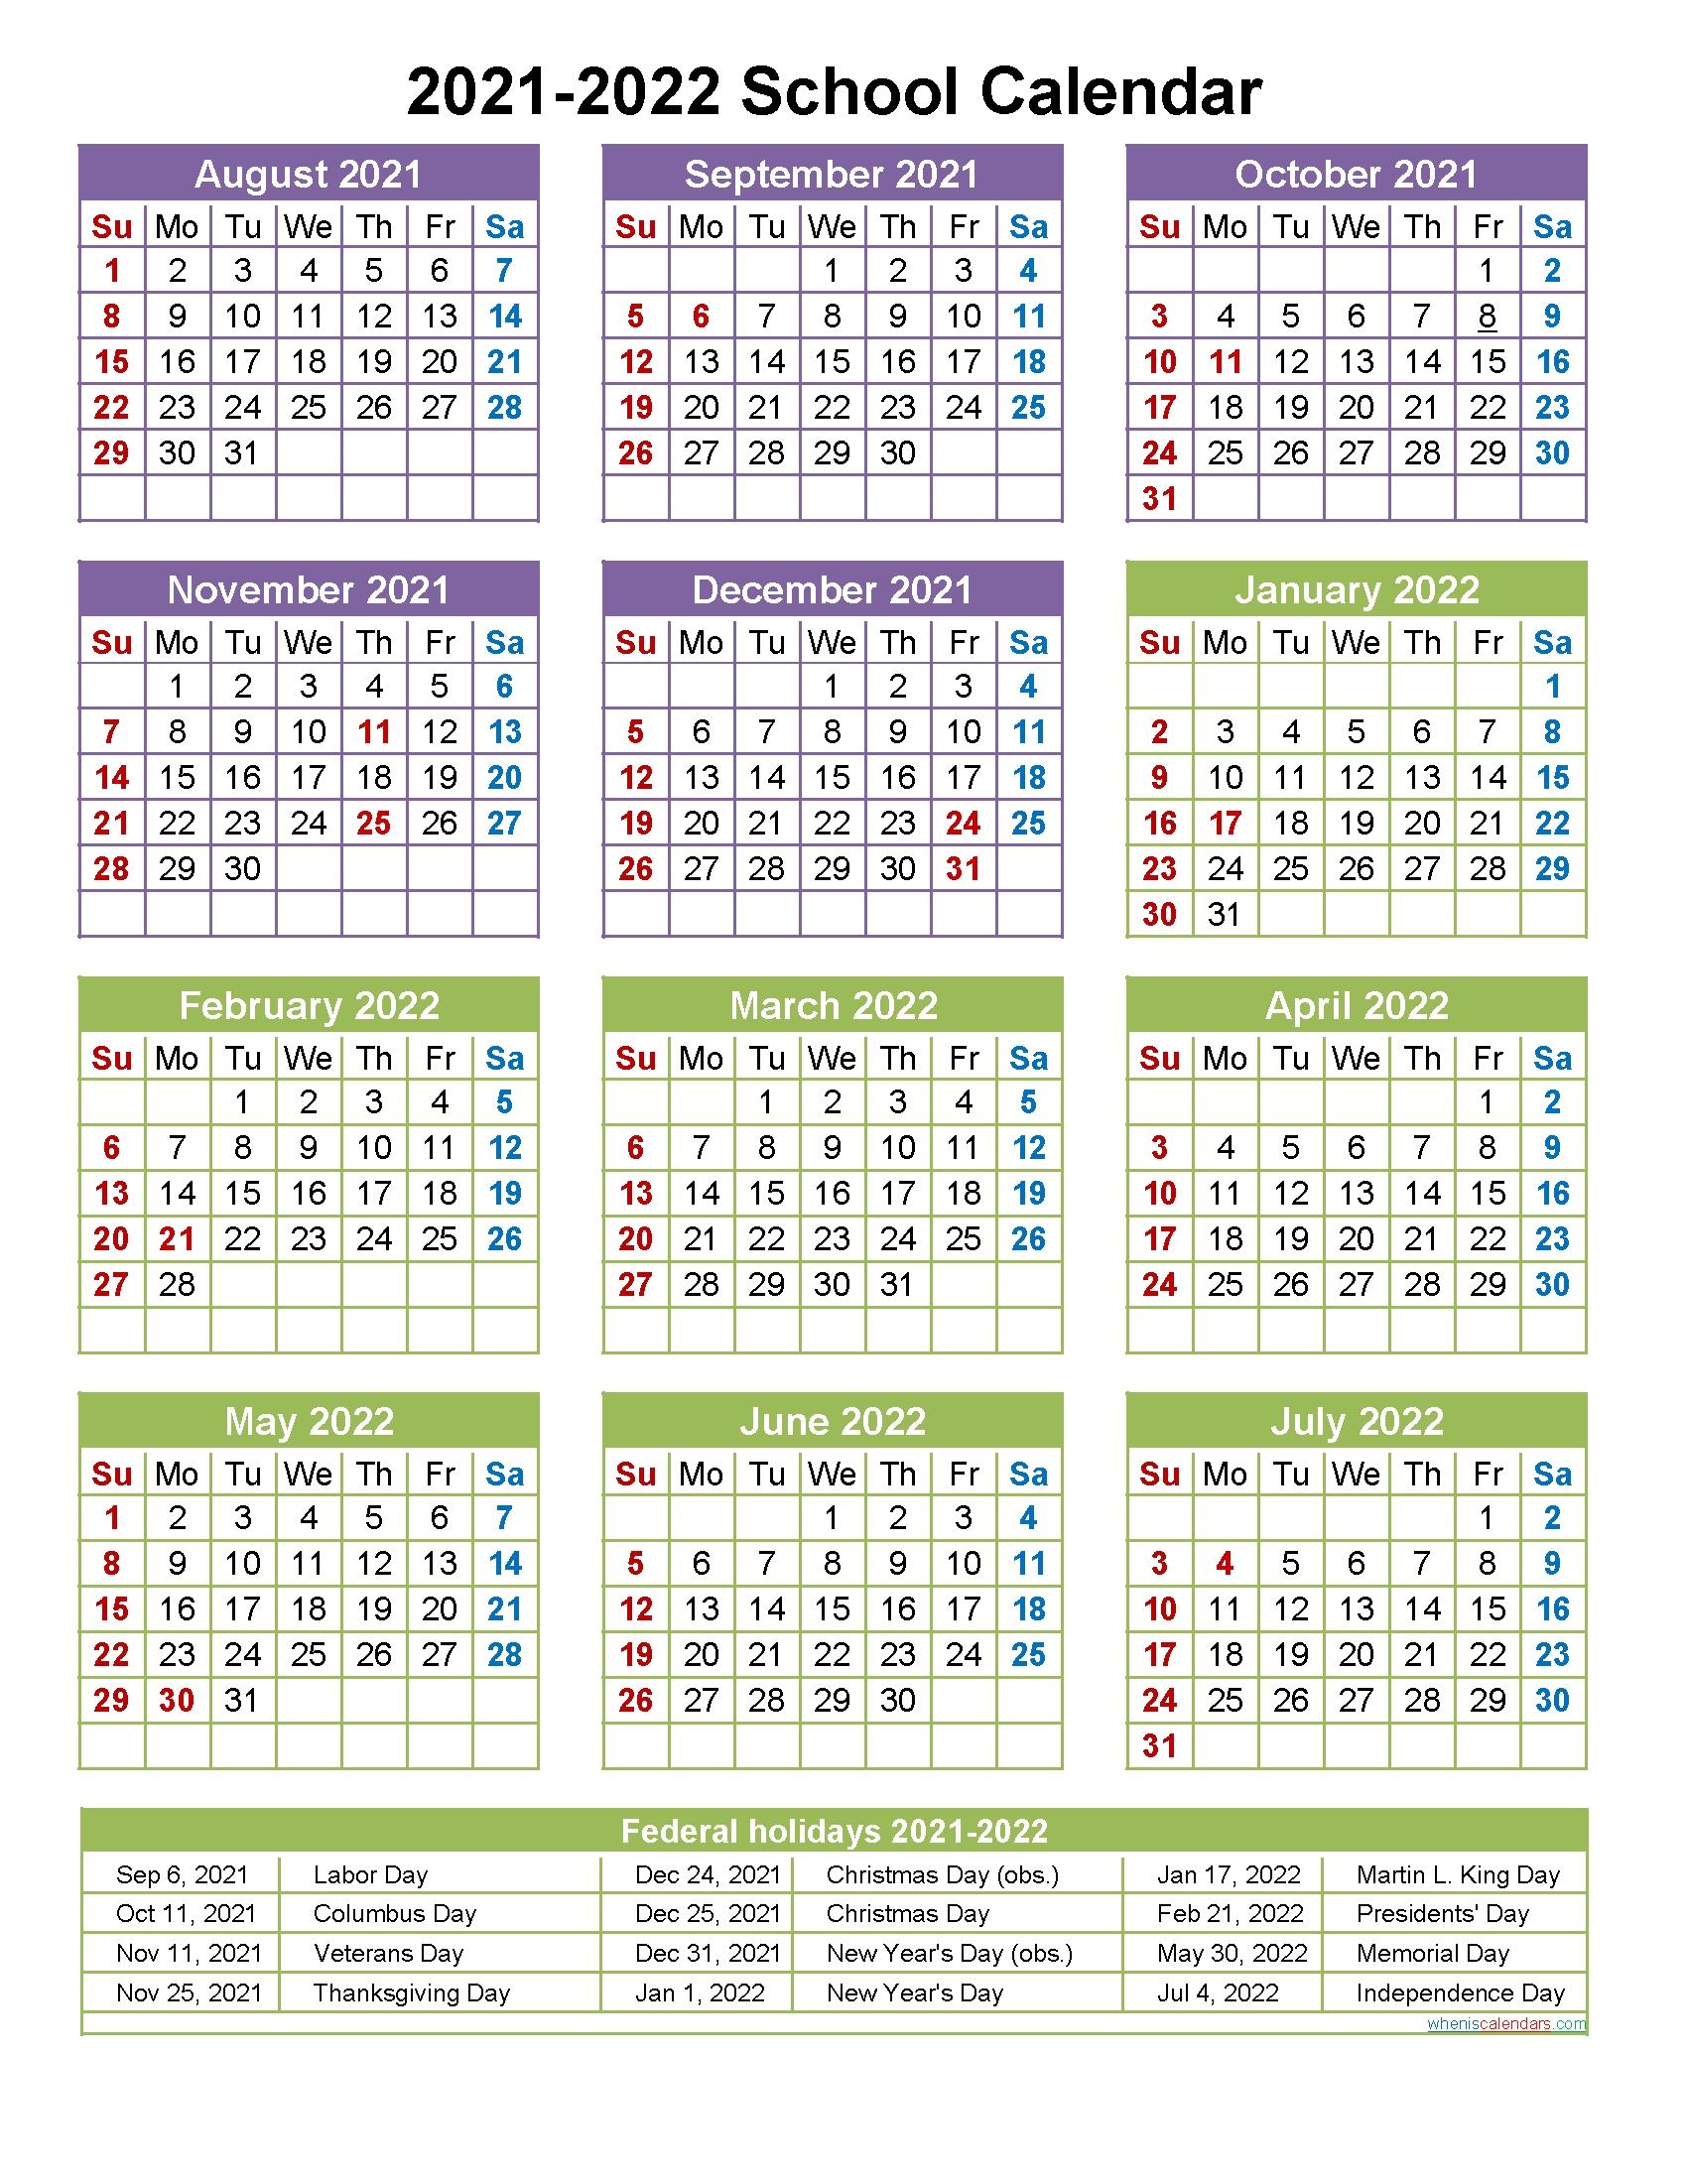 Free Printable 2021-2022 Calendar September | Printable Calendar with 3 Year Printable Calendar 2021 2021 2022 Graphics